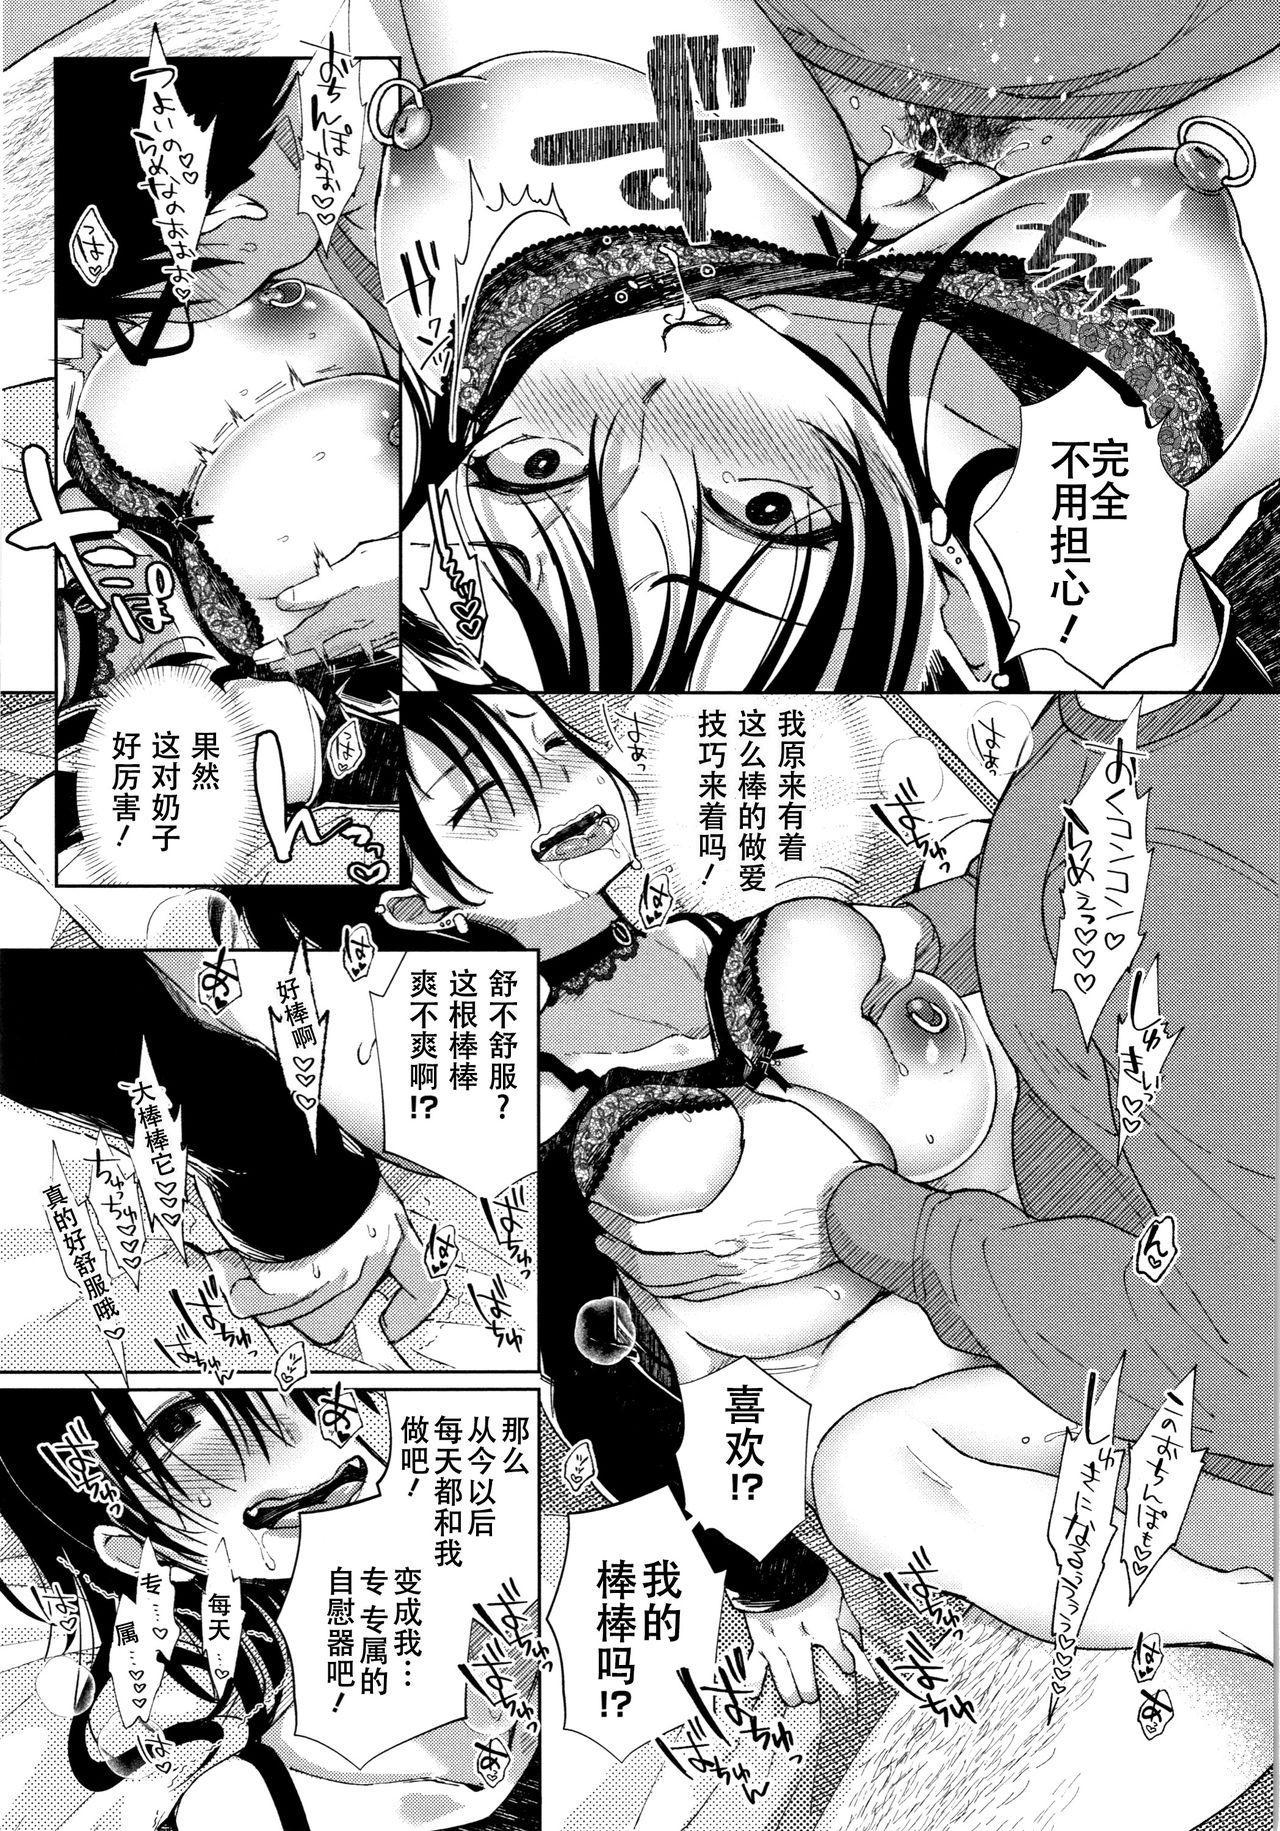 [Achumuchi] Saijaku Gal wa Ikizurai! - The weakest pussy is hard to go.ch.1-3 [Chinese] [战栗的玻璃棒汉化] [Ongoing] 15